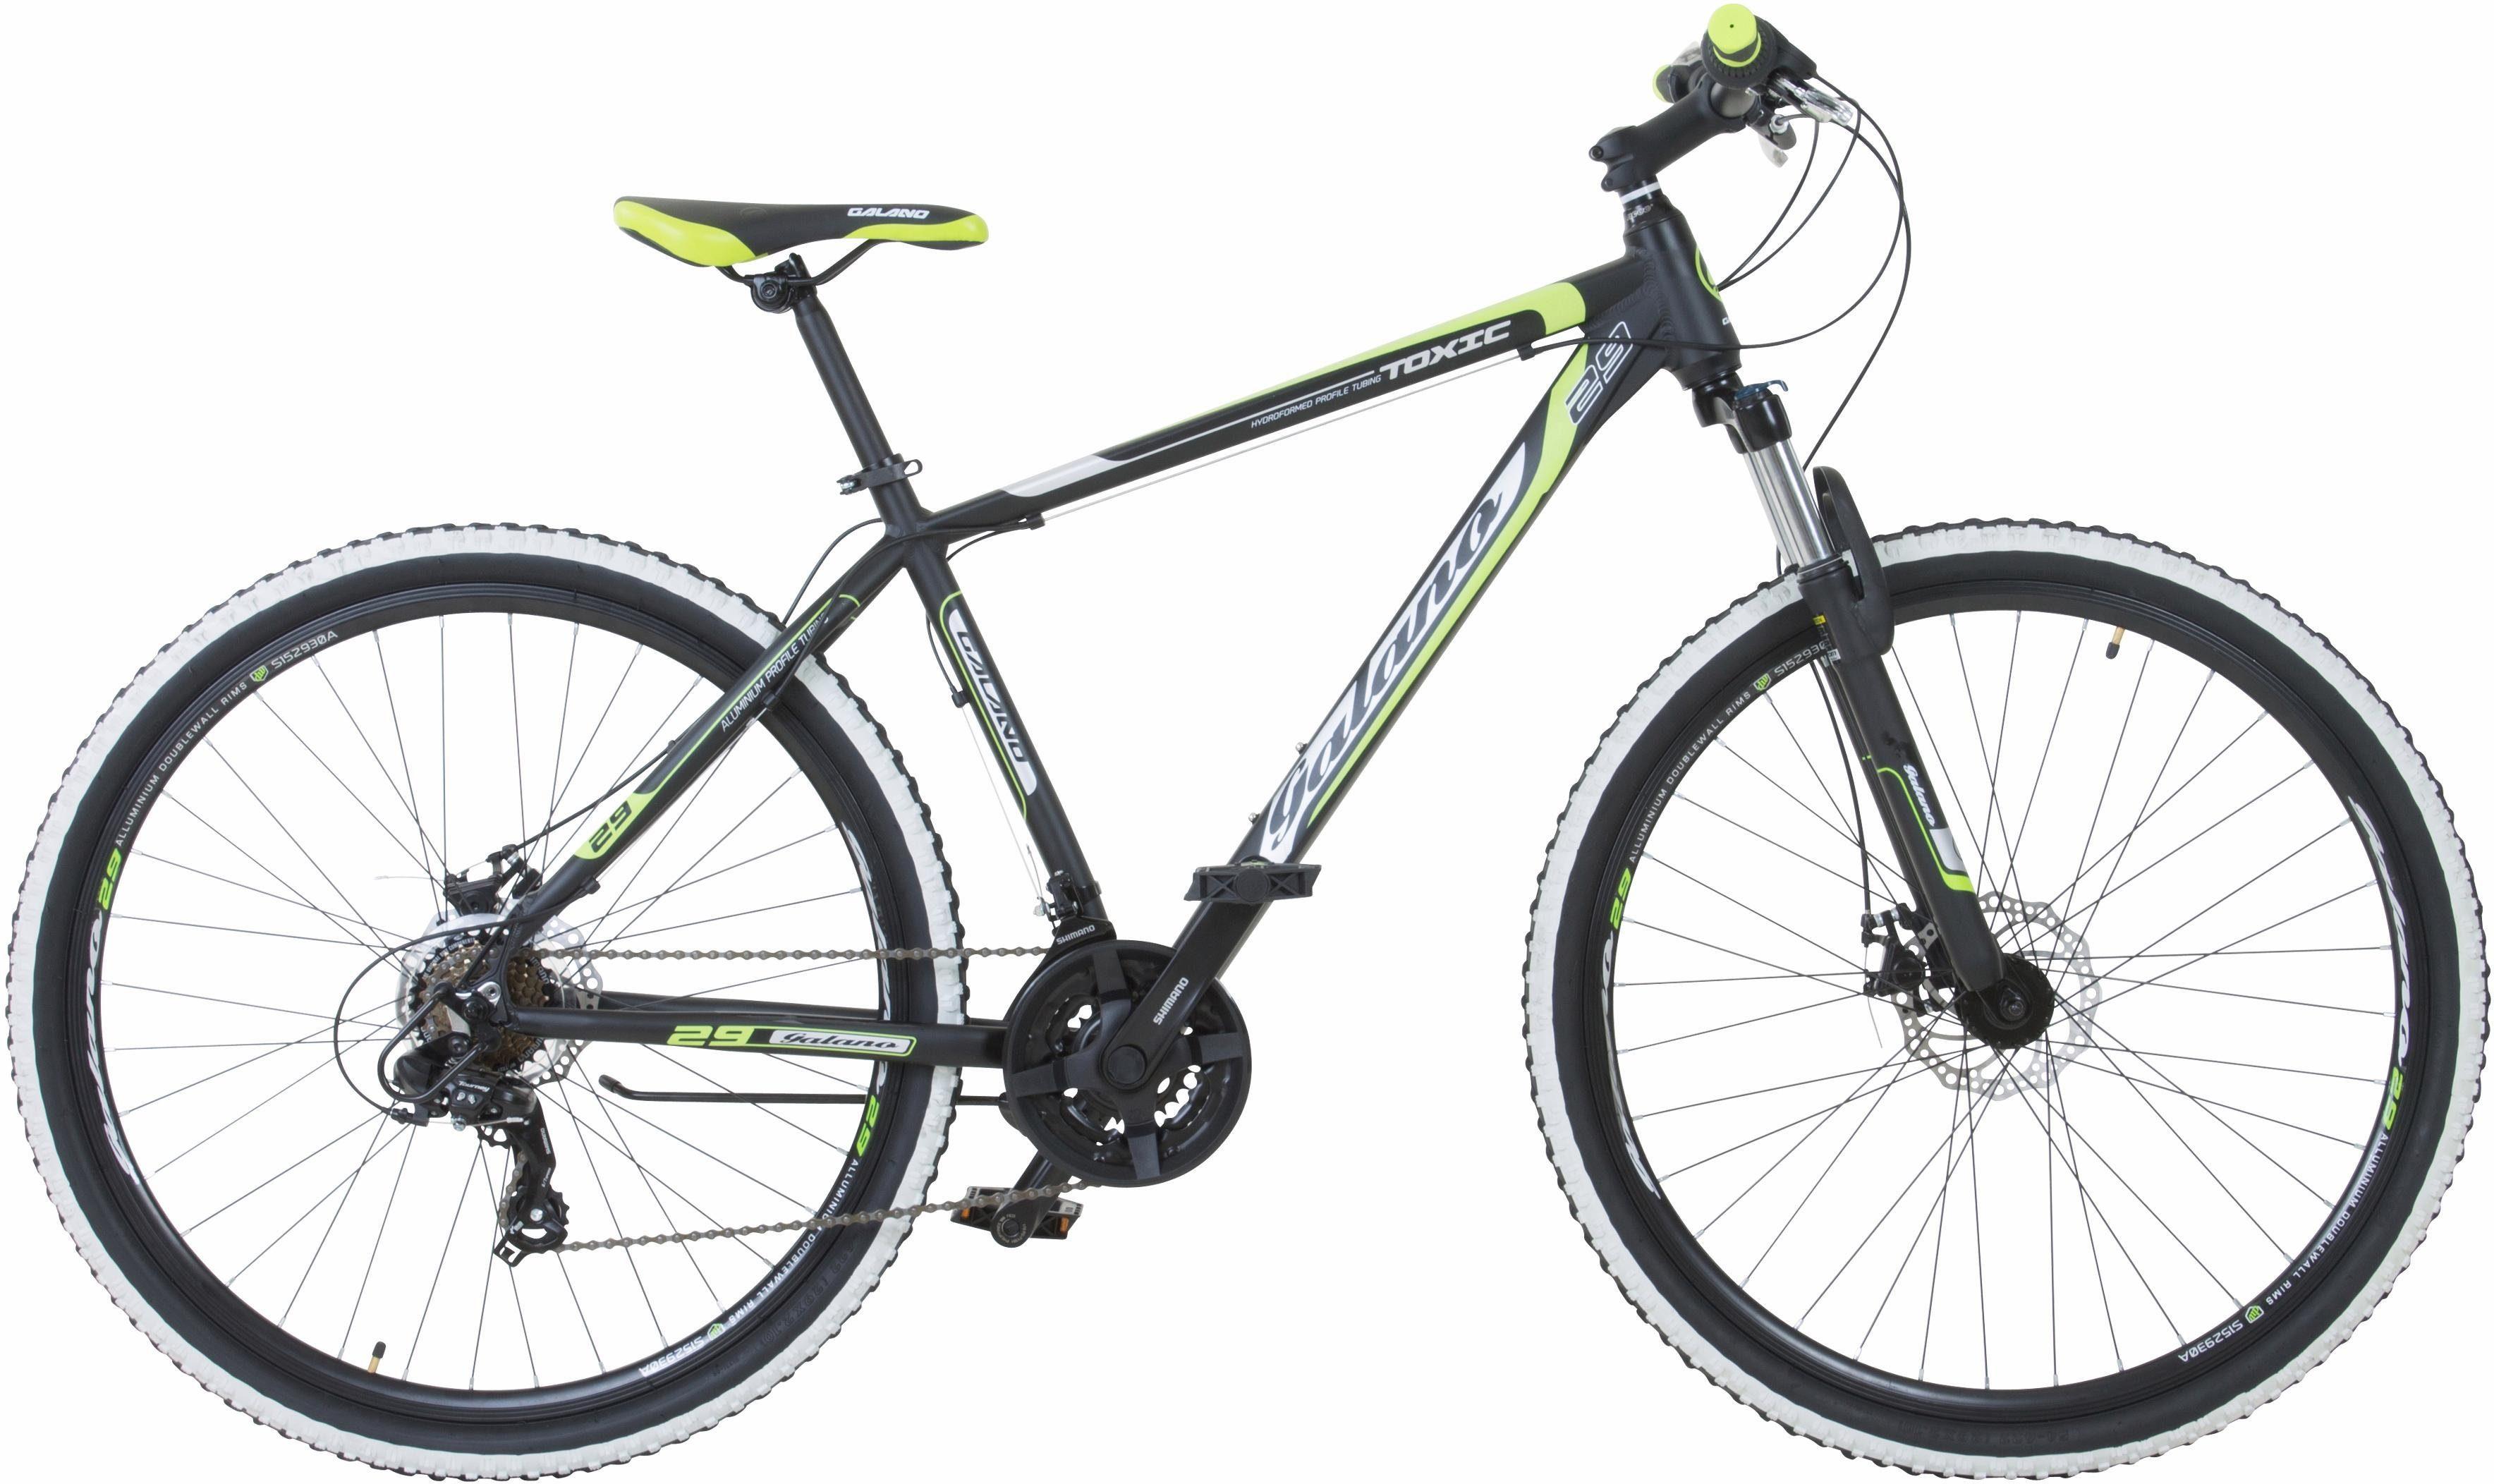 Galano Mountainbike »Toxic«, 21 Gang Shimano Tourney Schaltwerk, Kettenschaltung